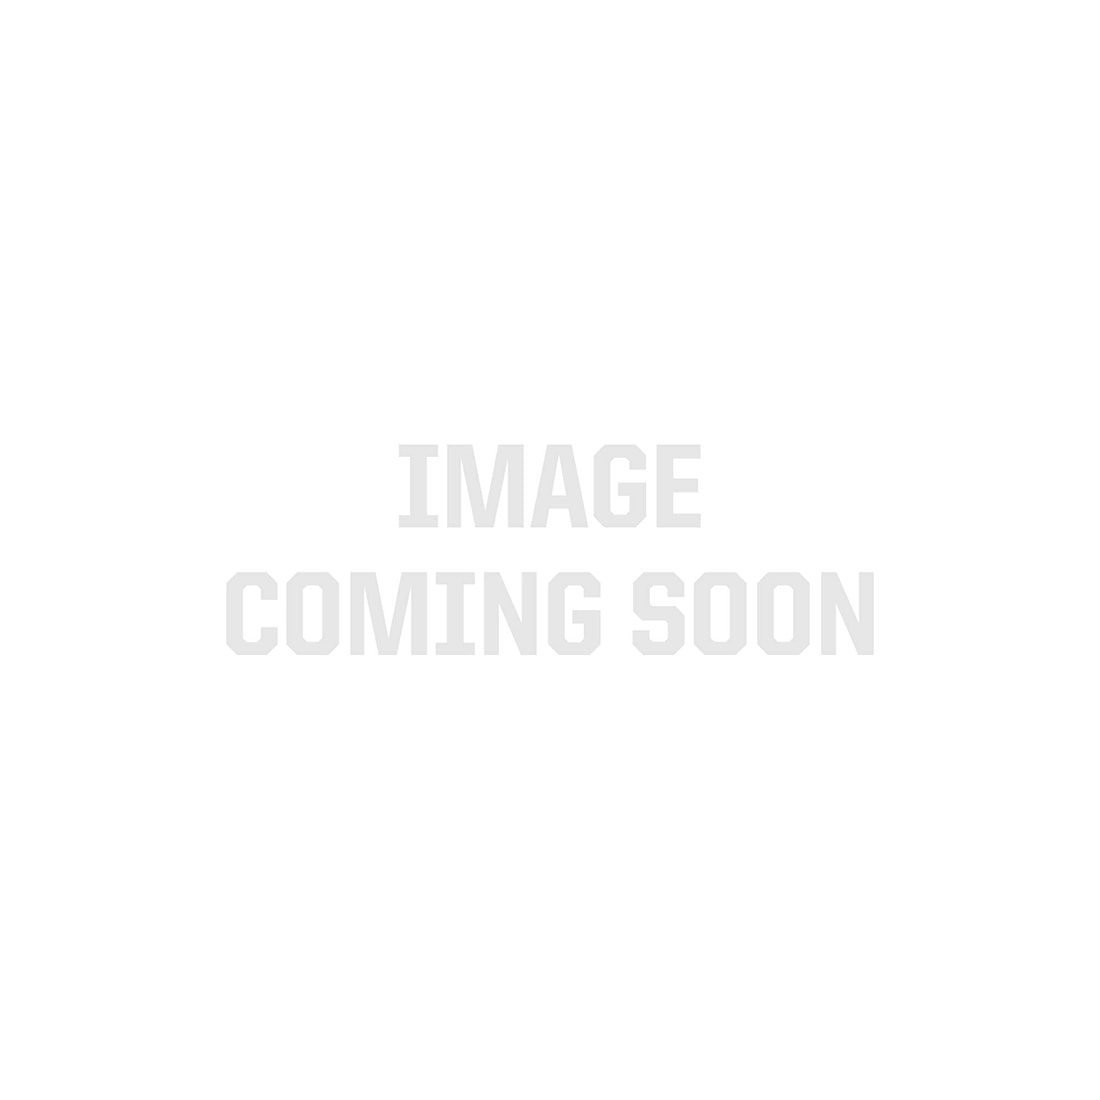 Pink 3528 Quad Row LED Strip Light, 450/m, 28mm wide, Sample Kit